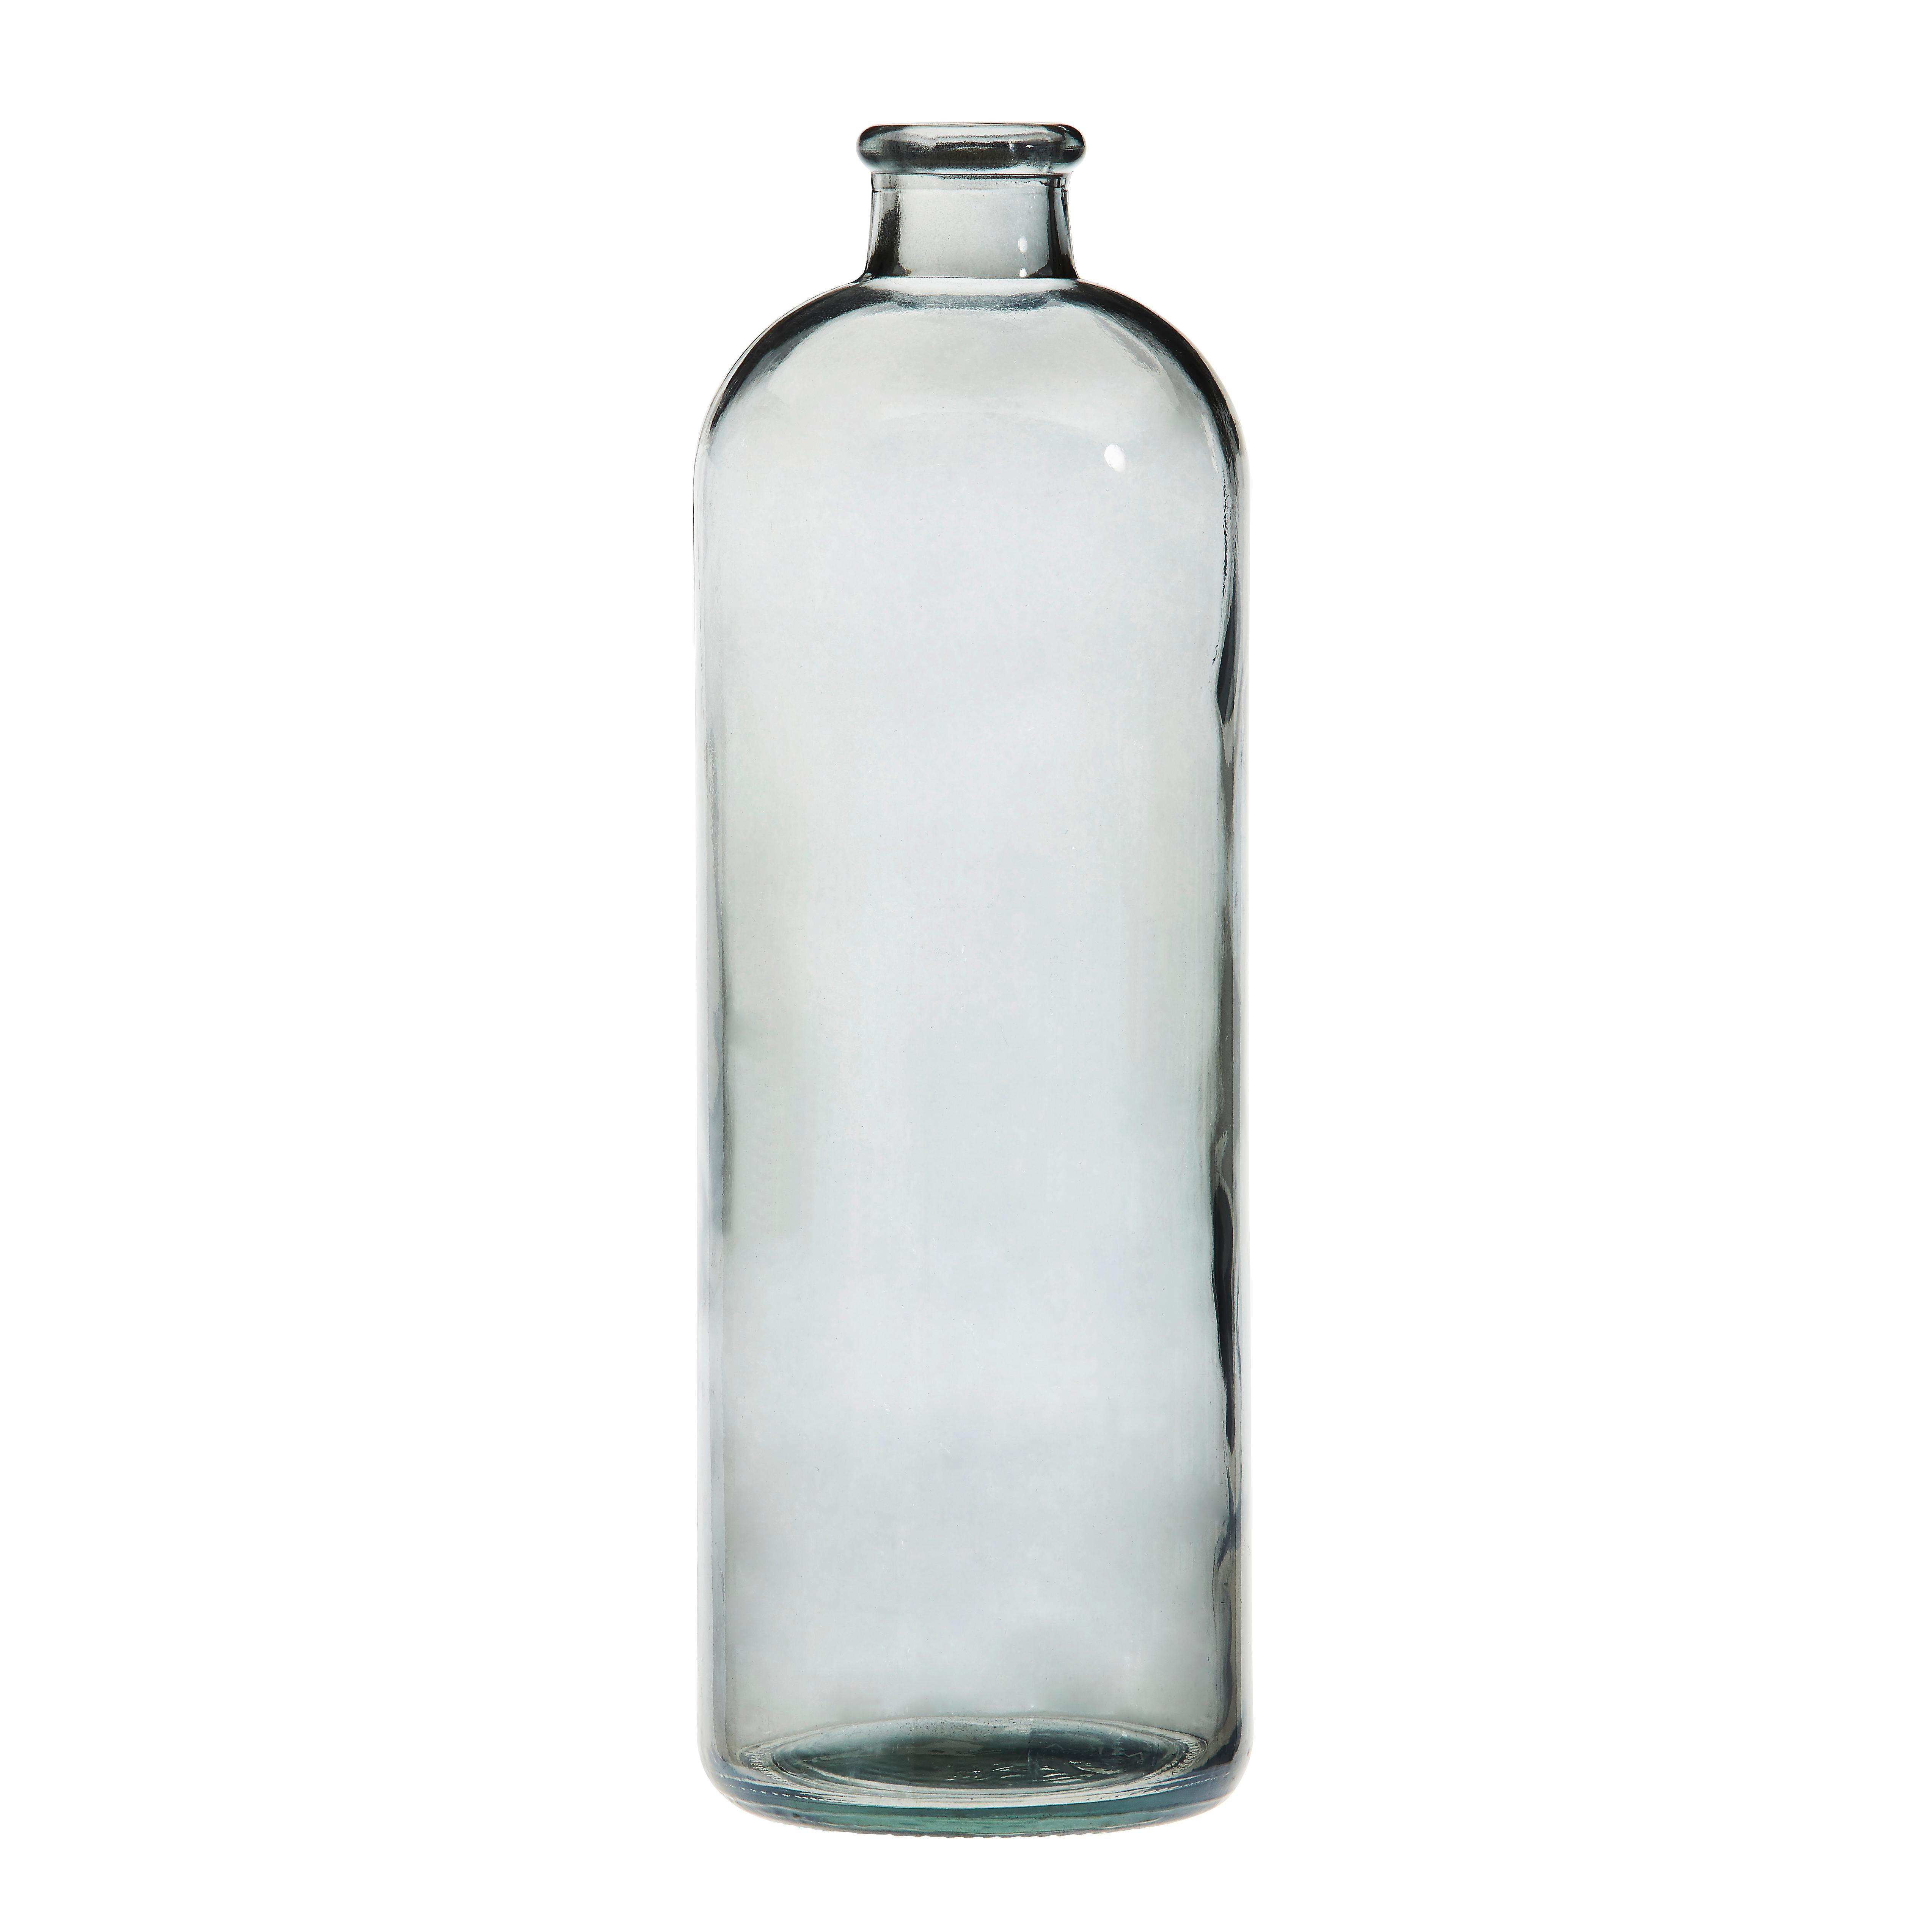 GLAS 11/33 cm Grau, Klar - Klar/Grau, Glas (11/33cm)